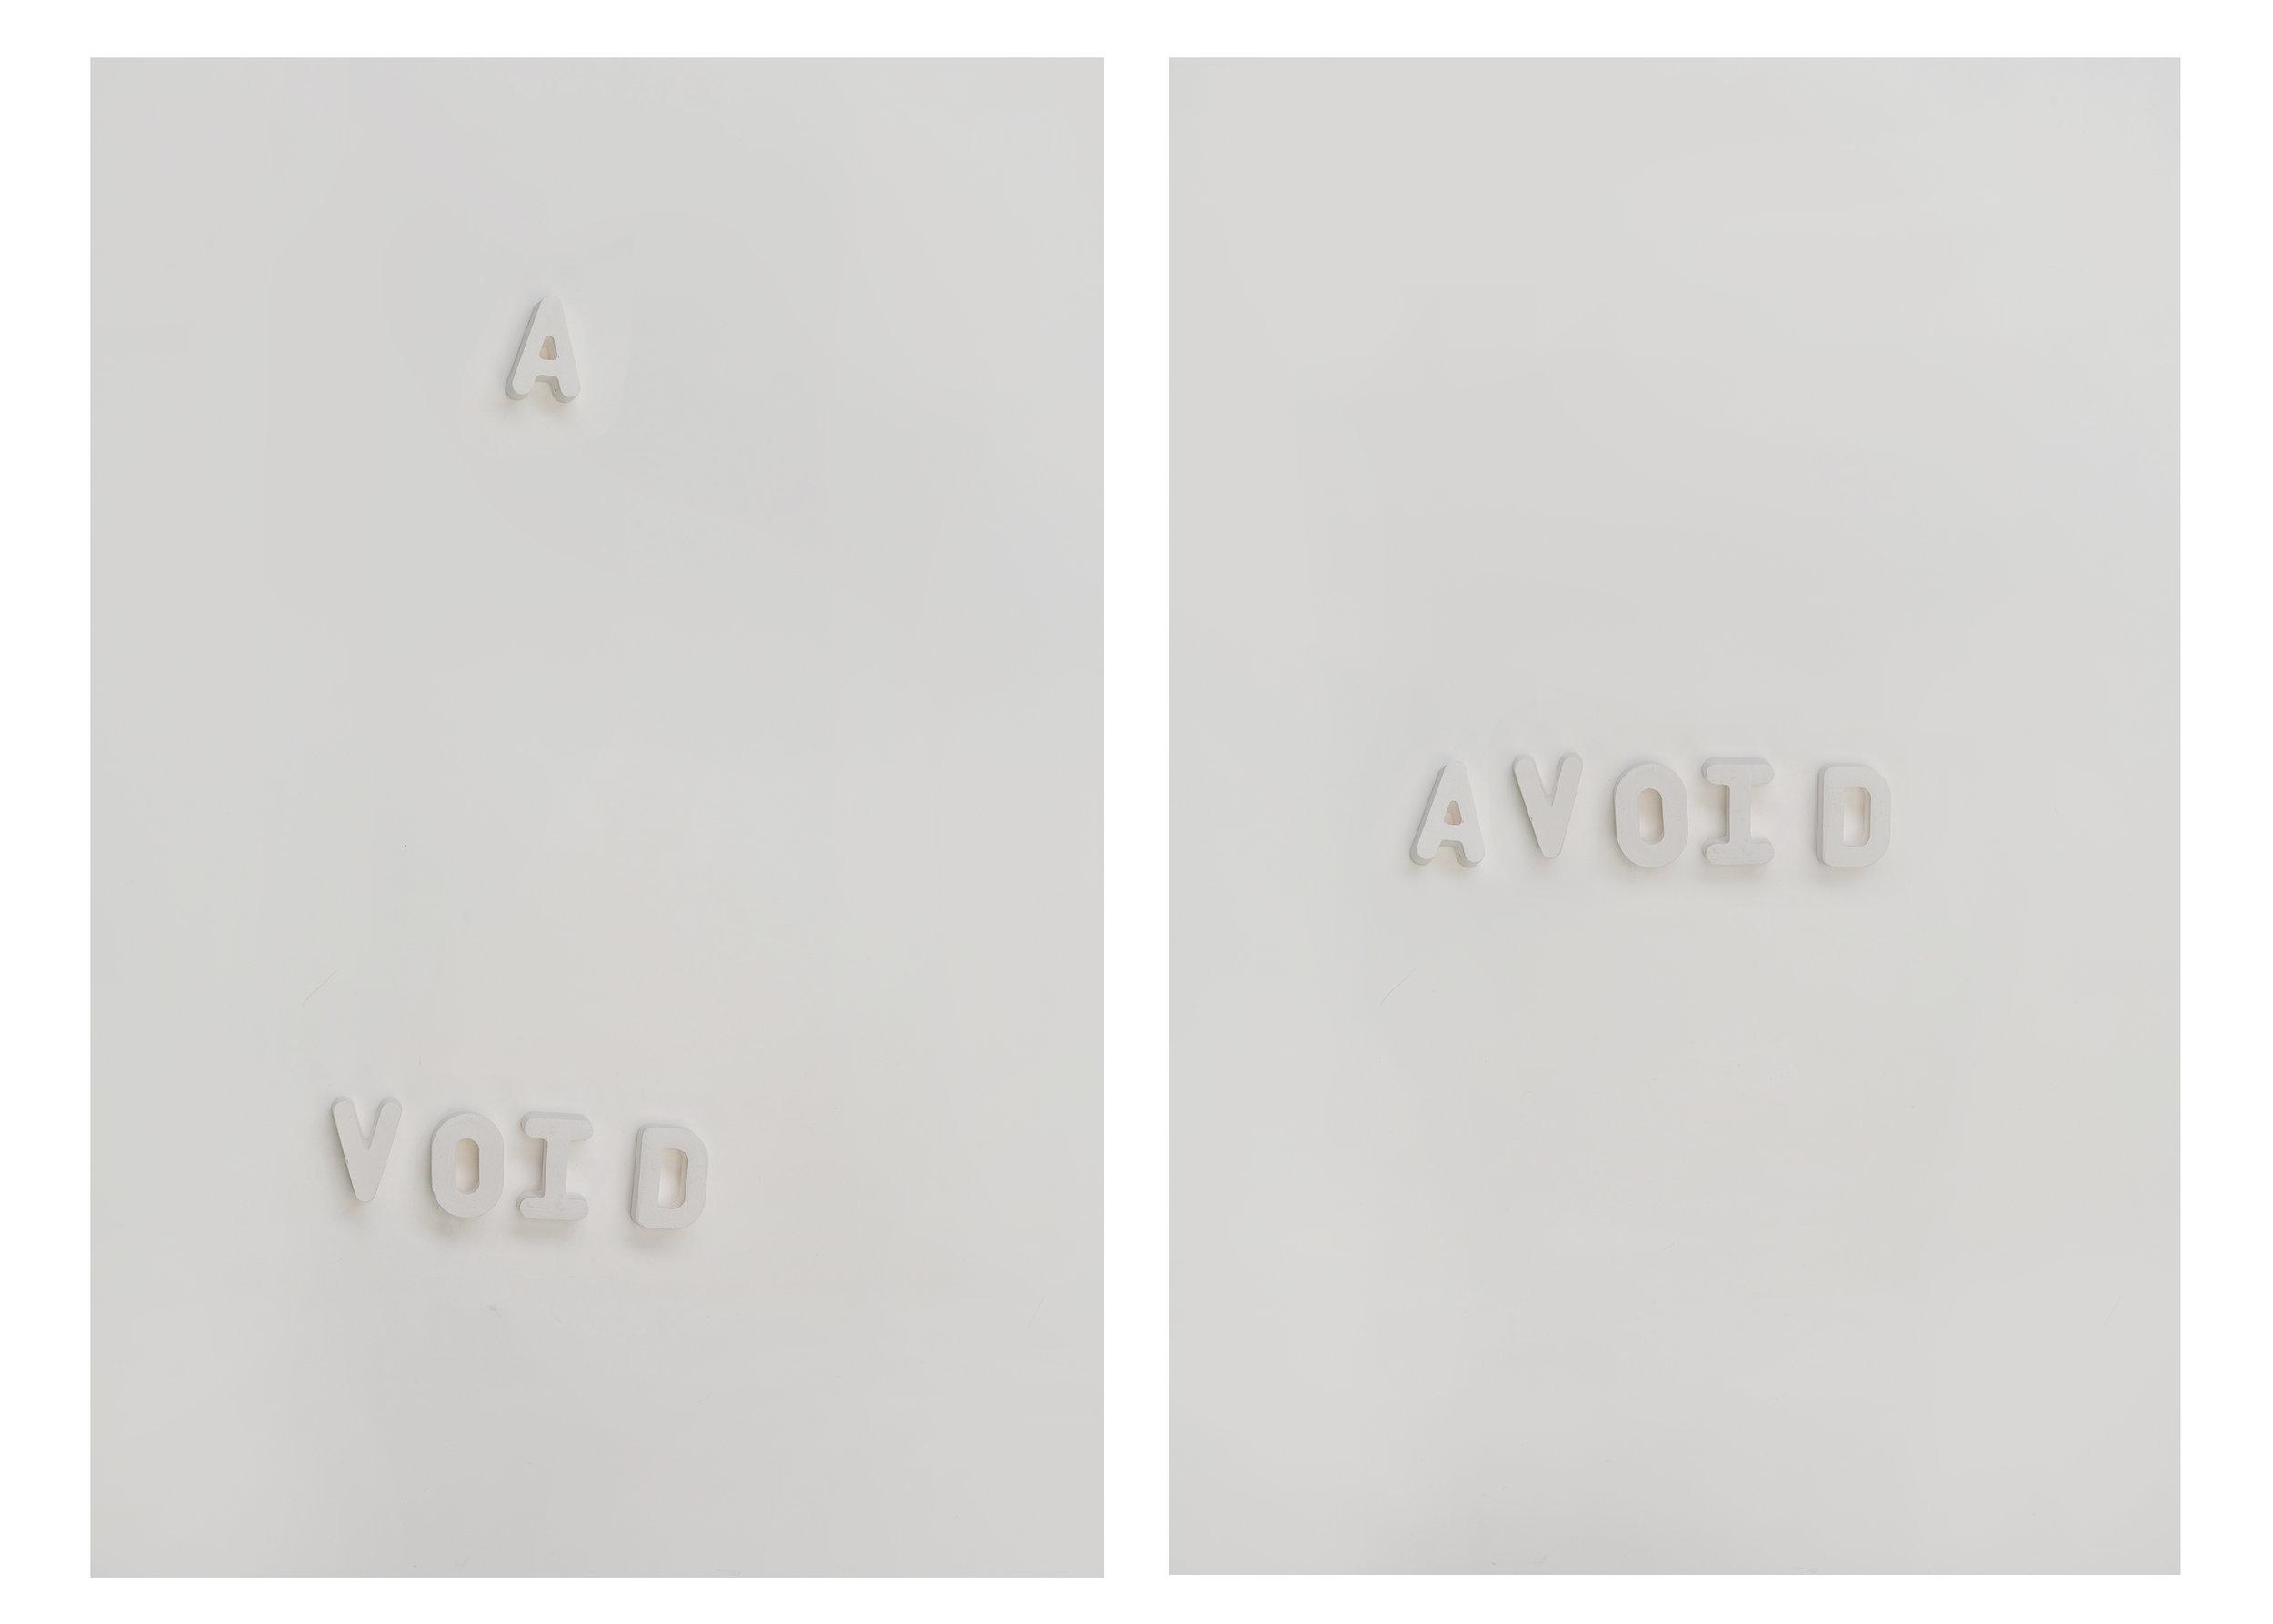 A Void_Avoid.jpg